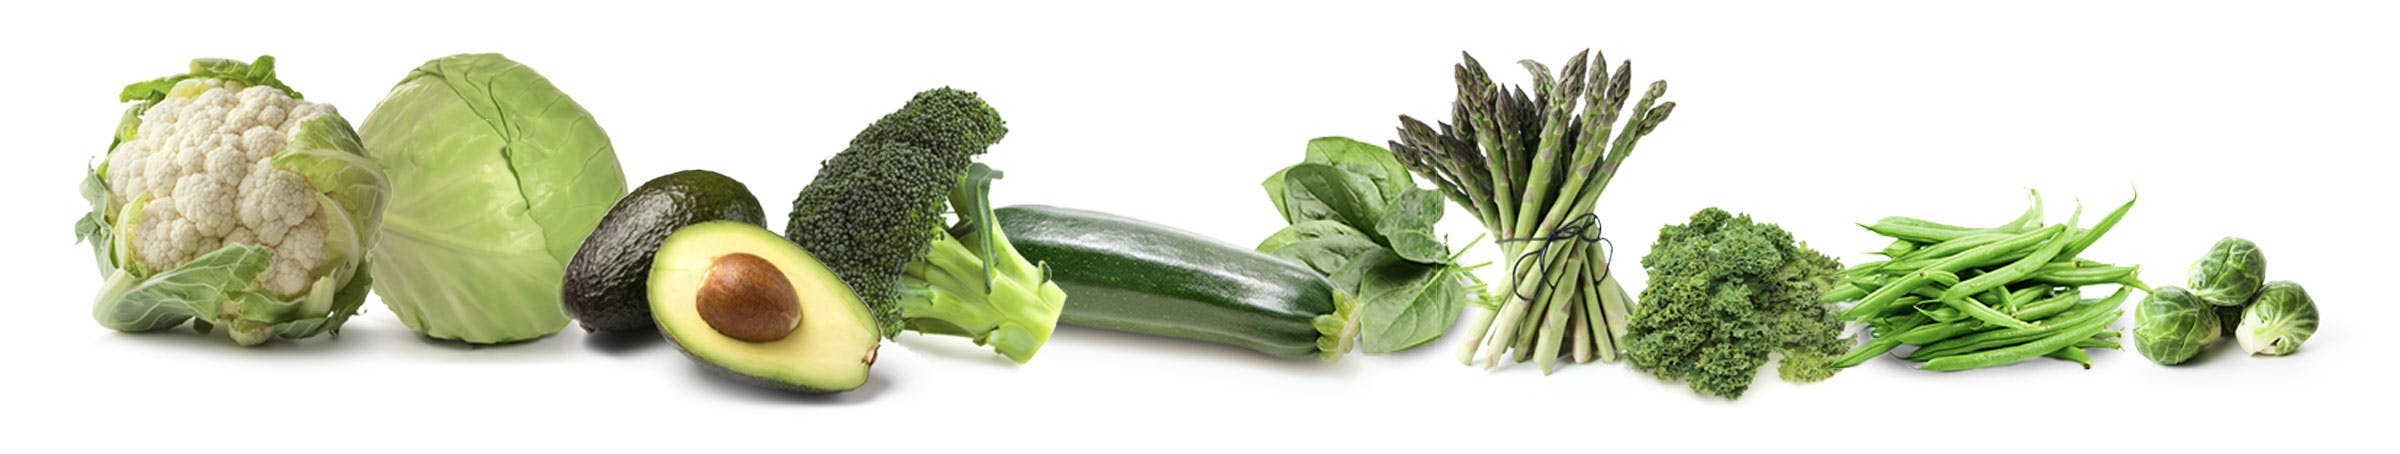 The Palto top 10 keto vegetbles.jpg